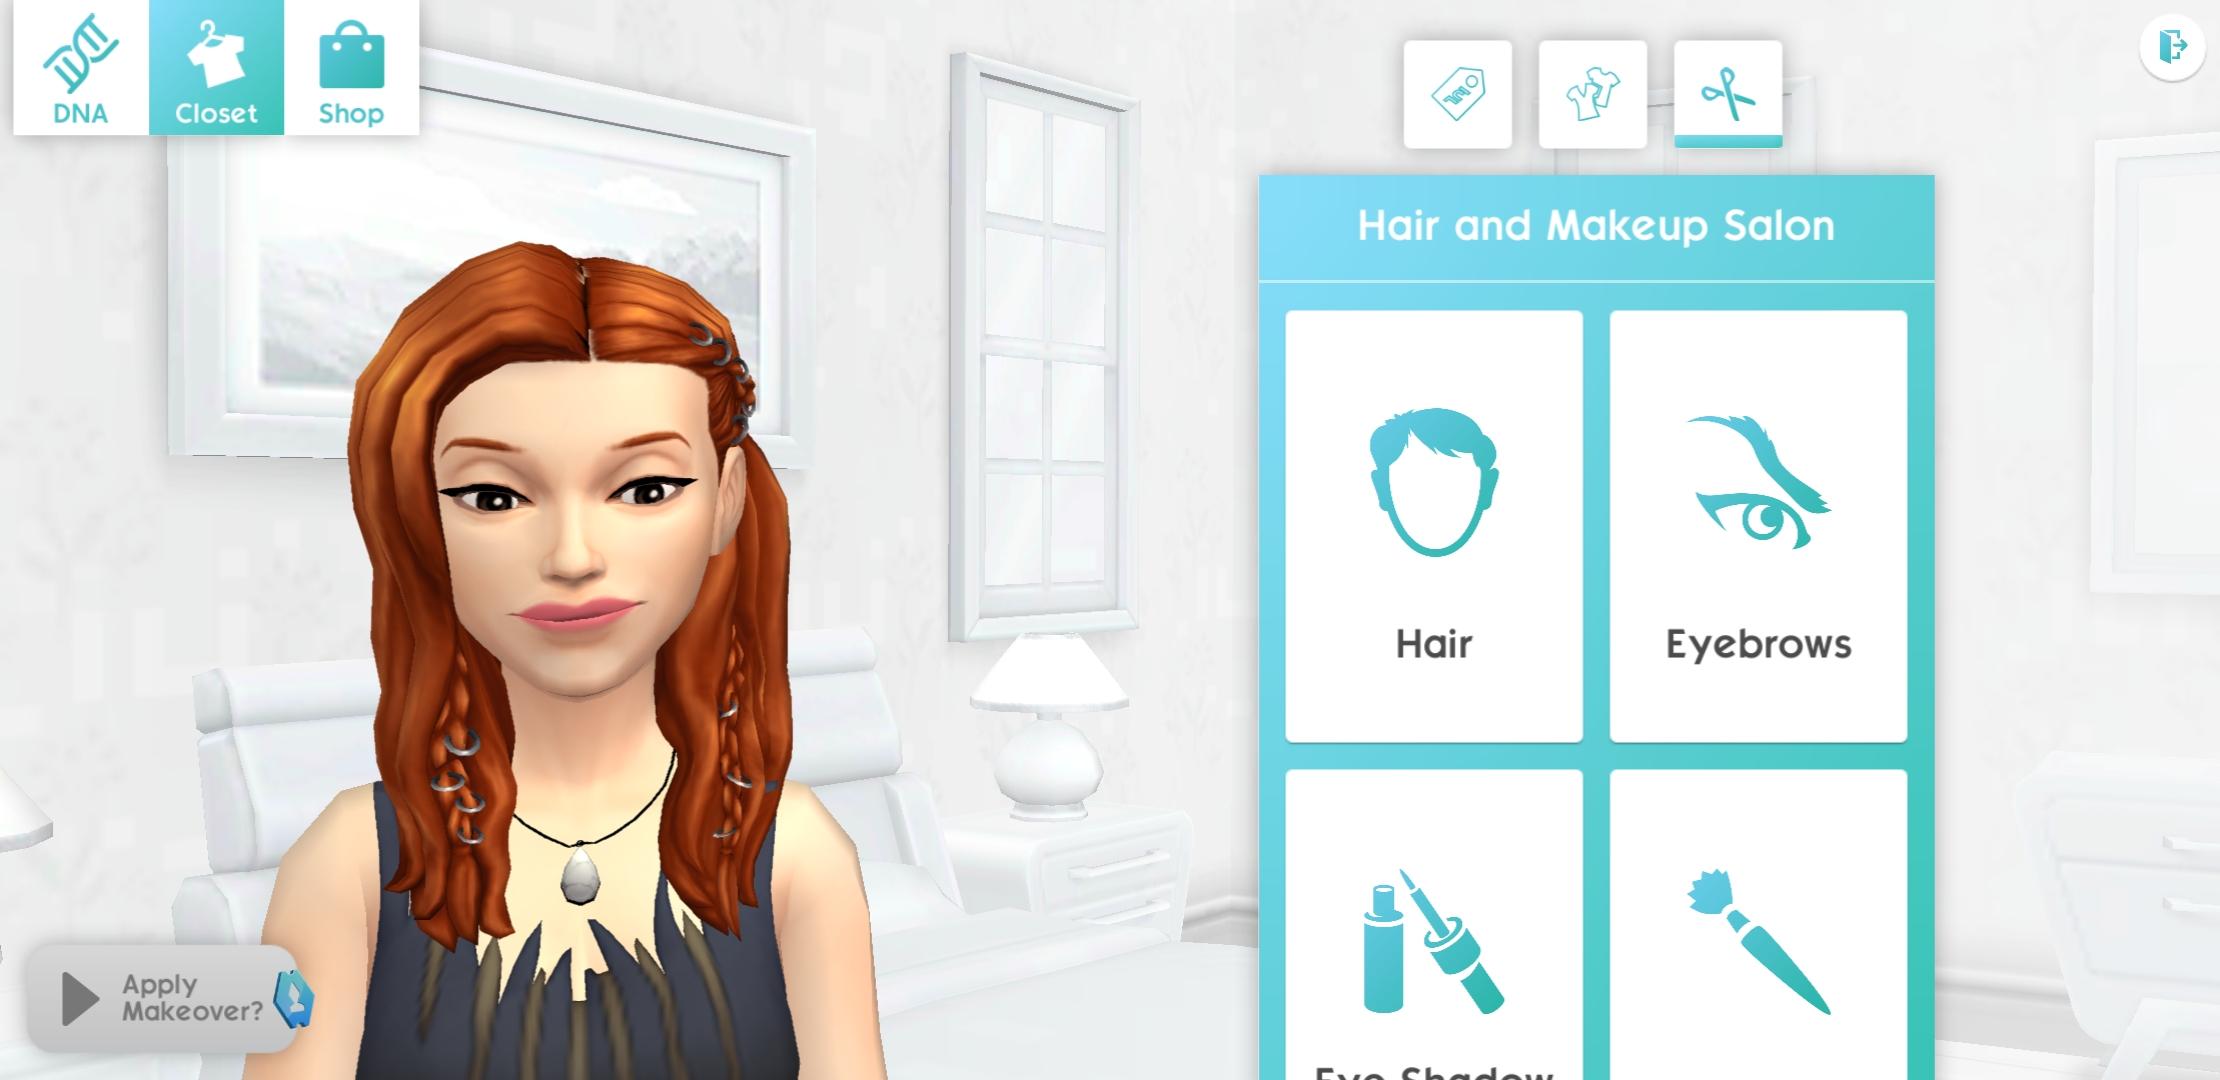 Screenshot_20190426-020316_The Sims.jpg